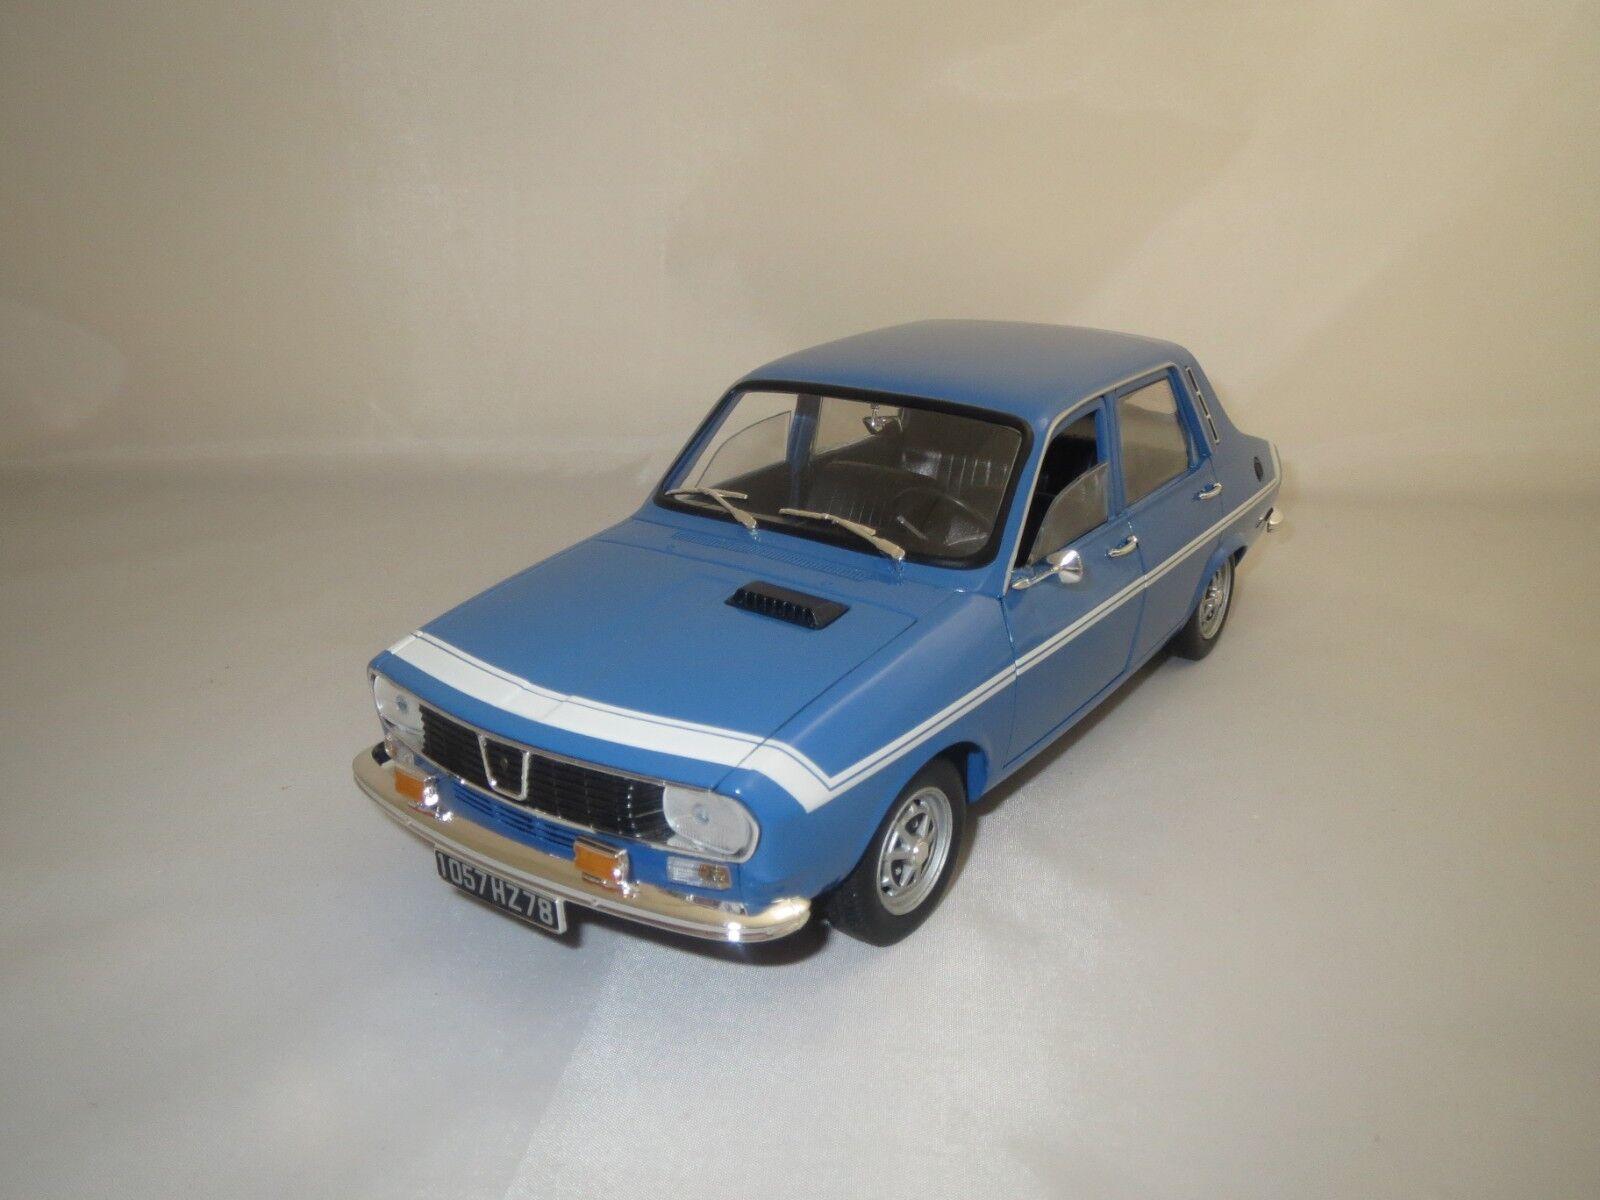 Solido renault 12 Gordini (blu) 1 18 sin embalaje